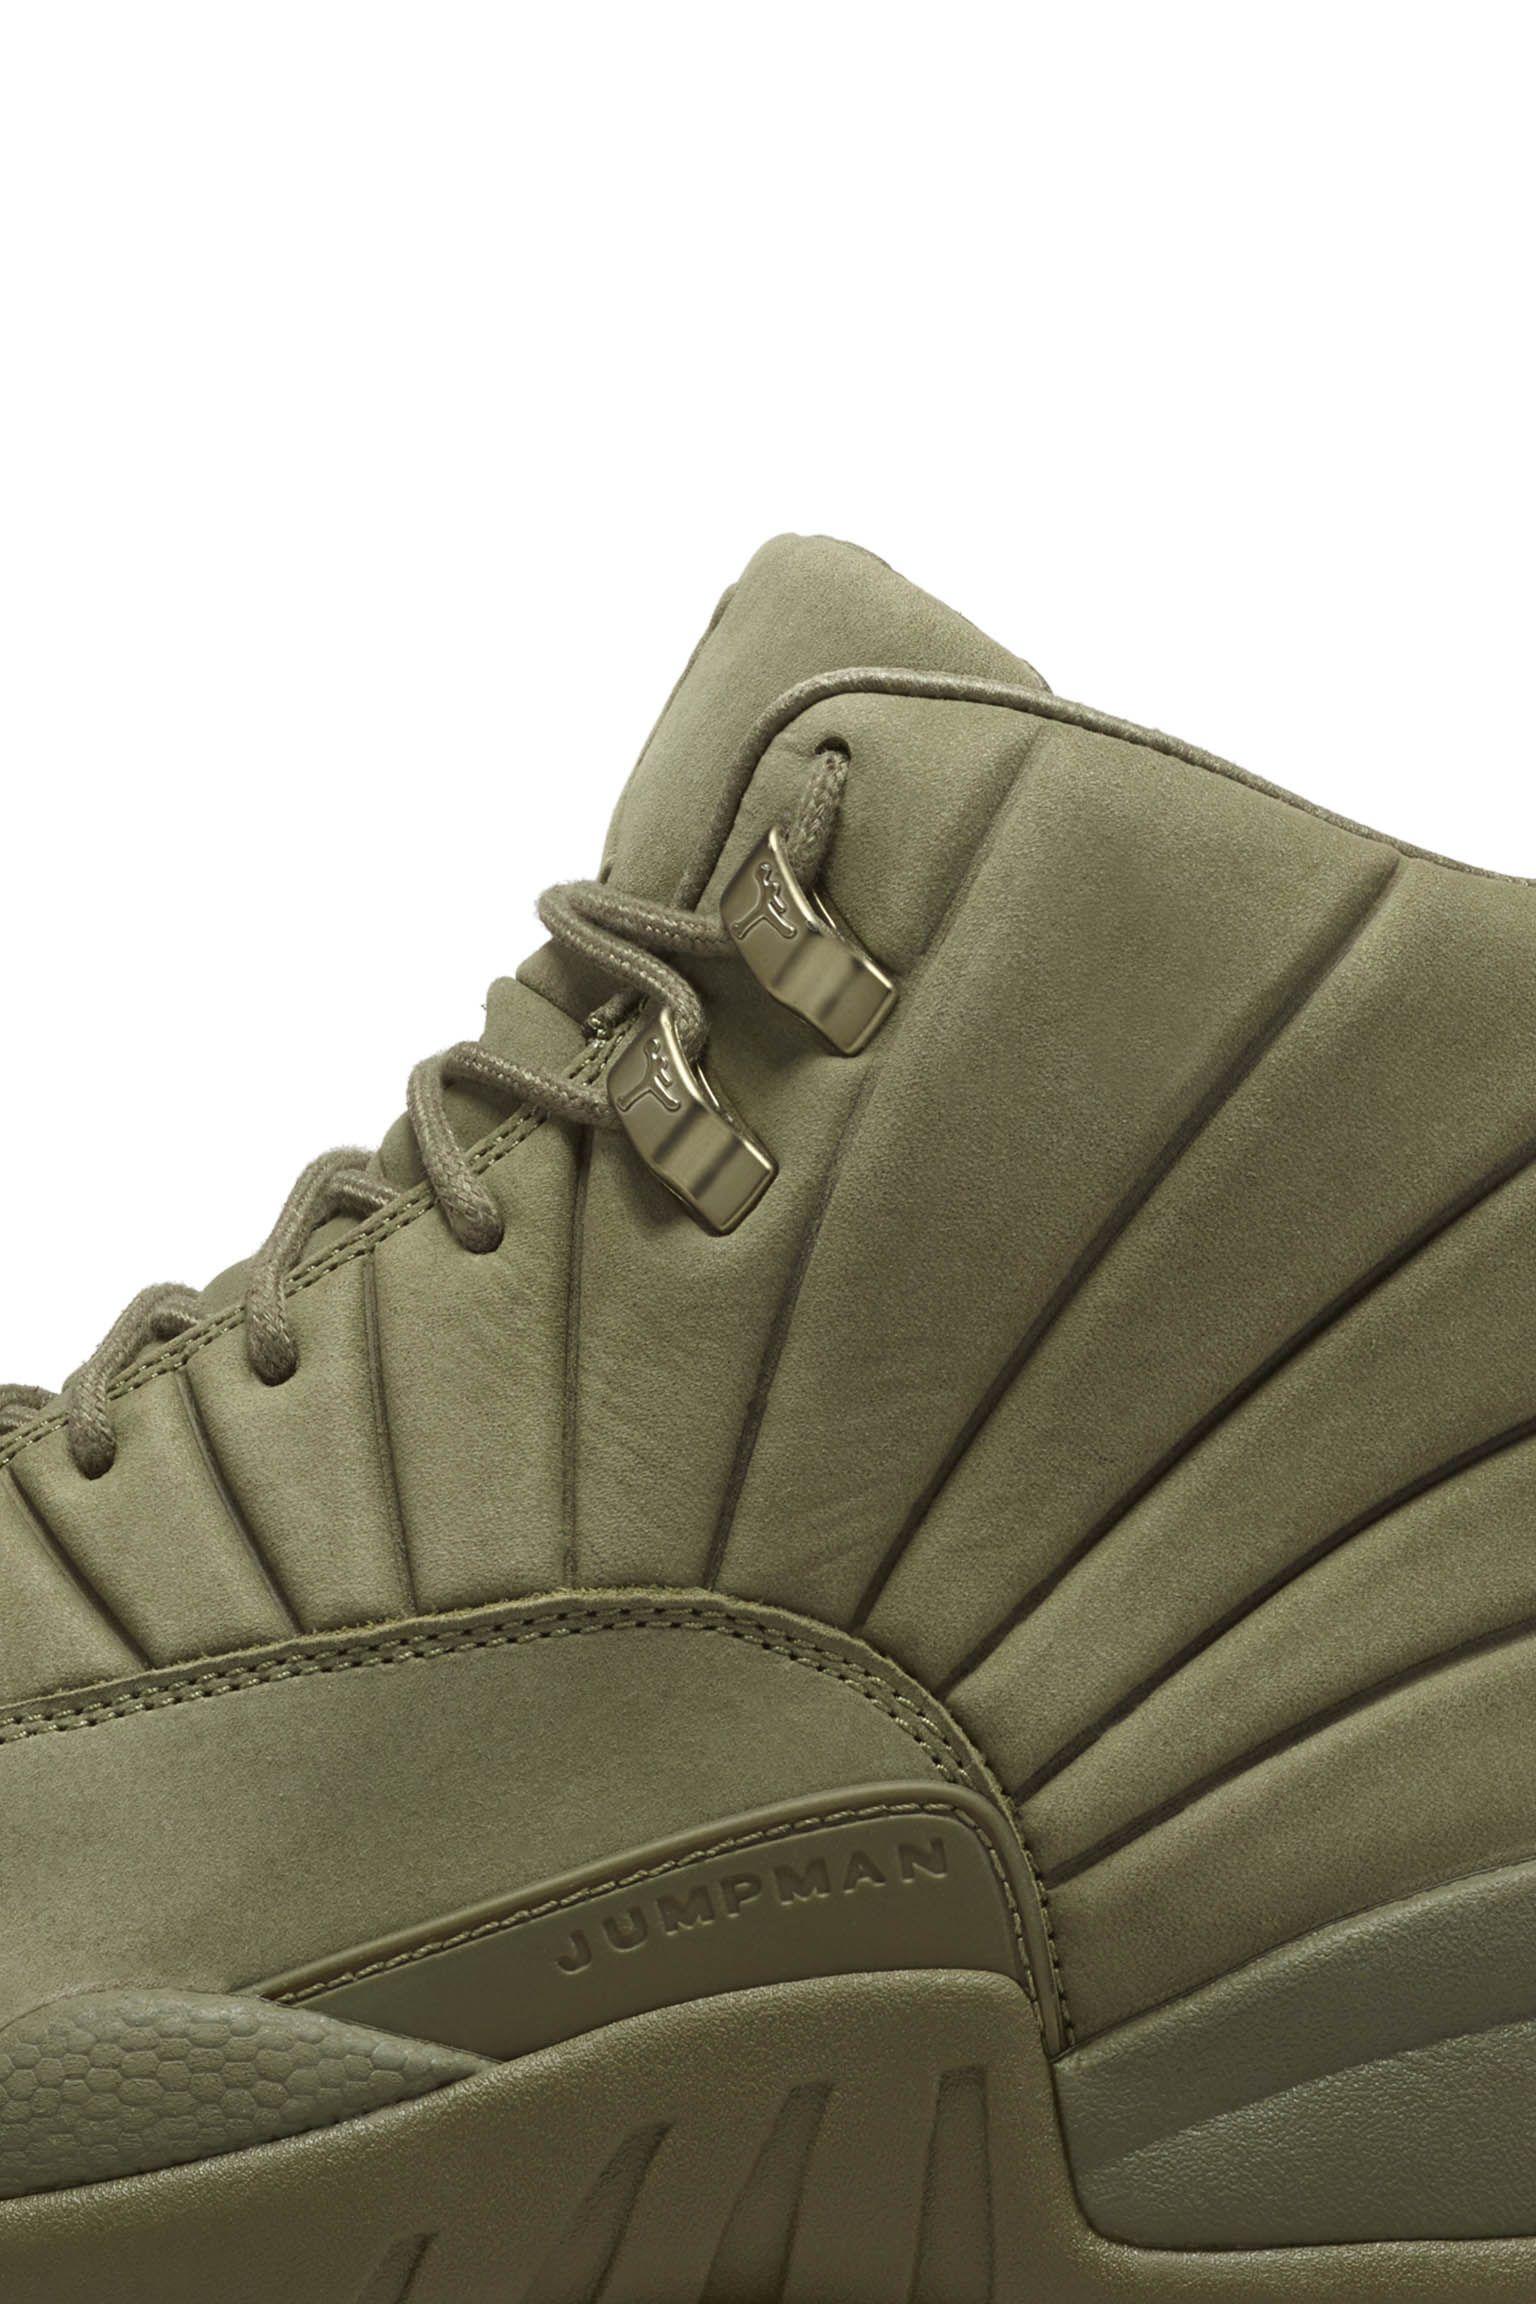 3fe0c2d71a16 Air Jordan 12 Retro PSNY  Medium Olive  Release Date. Nike+ Launch NL